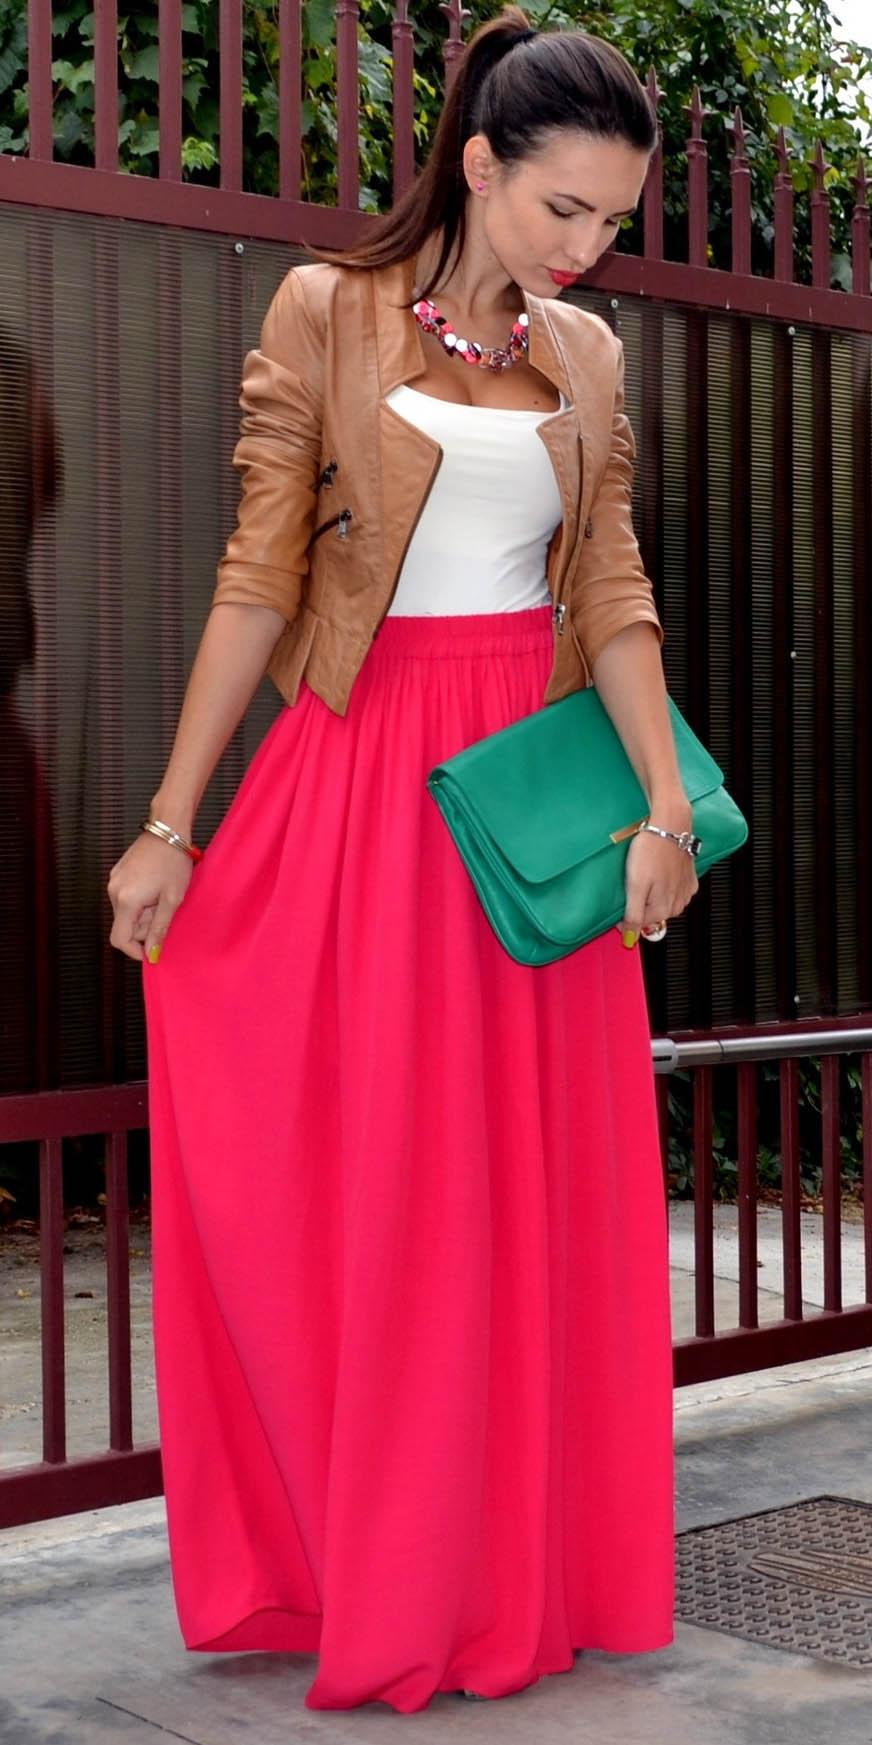 pink-magenta-maxi-skirt-white-cami-necklace-green-bag-clutch-pony-camel-jacket-moto-fall-winter-brun-dinner.jpg